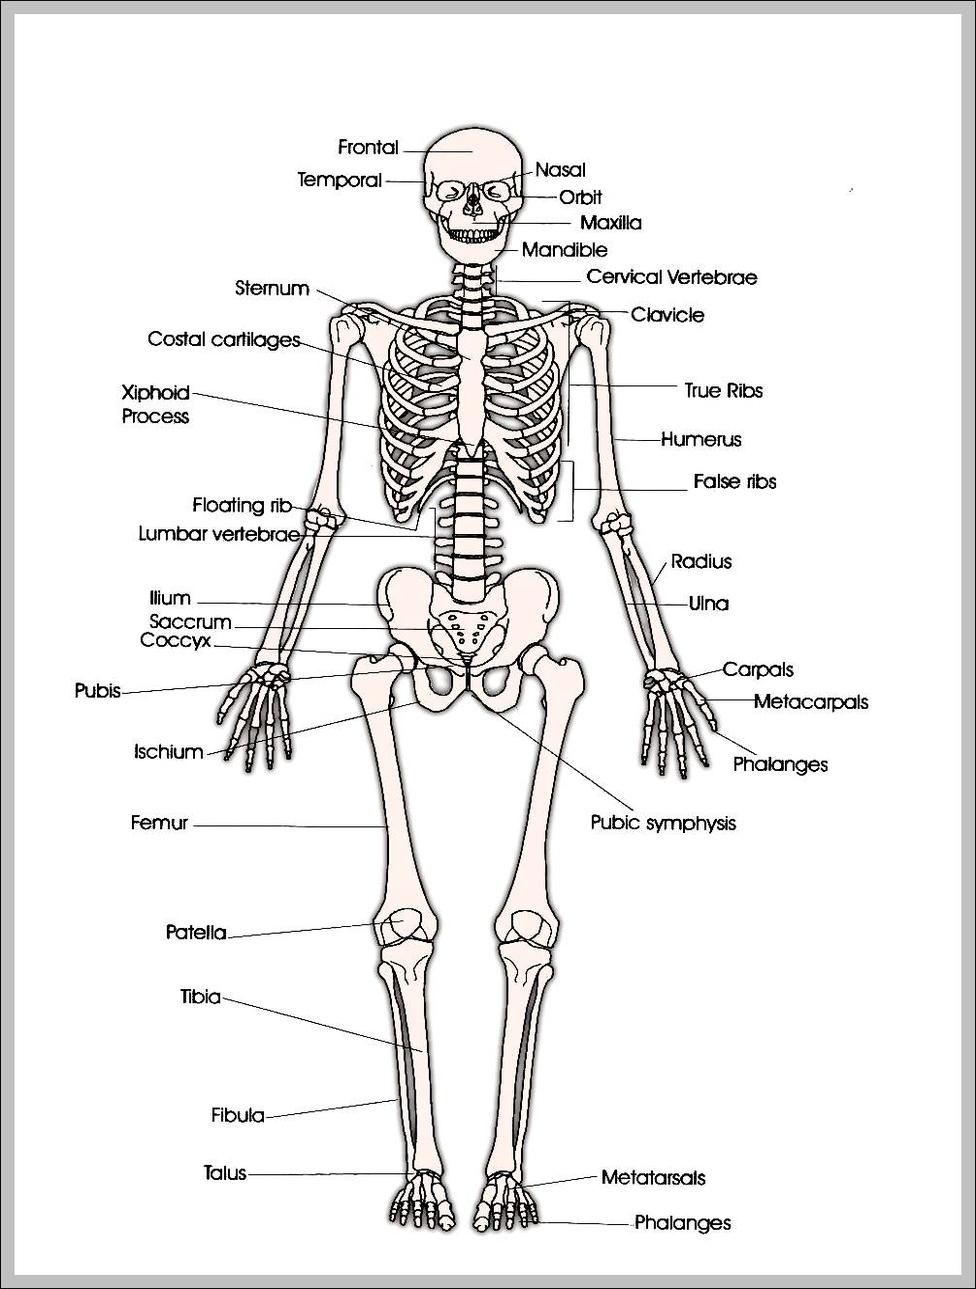 hight resolution of human skeleton anatomy anatomy system human body anatomy diagramprintable human skeleton diagram printable human skeleton chart